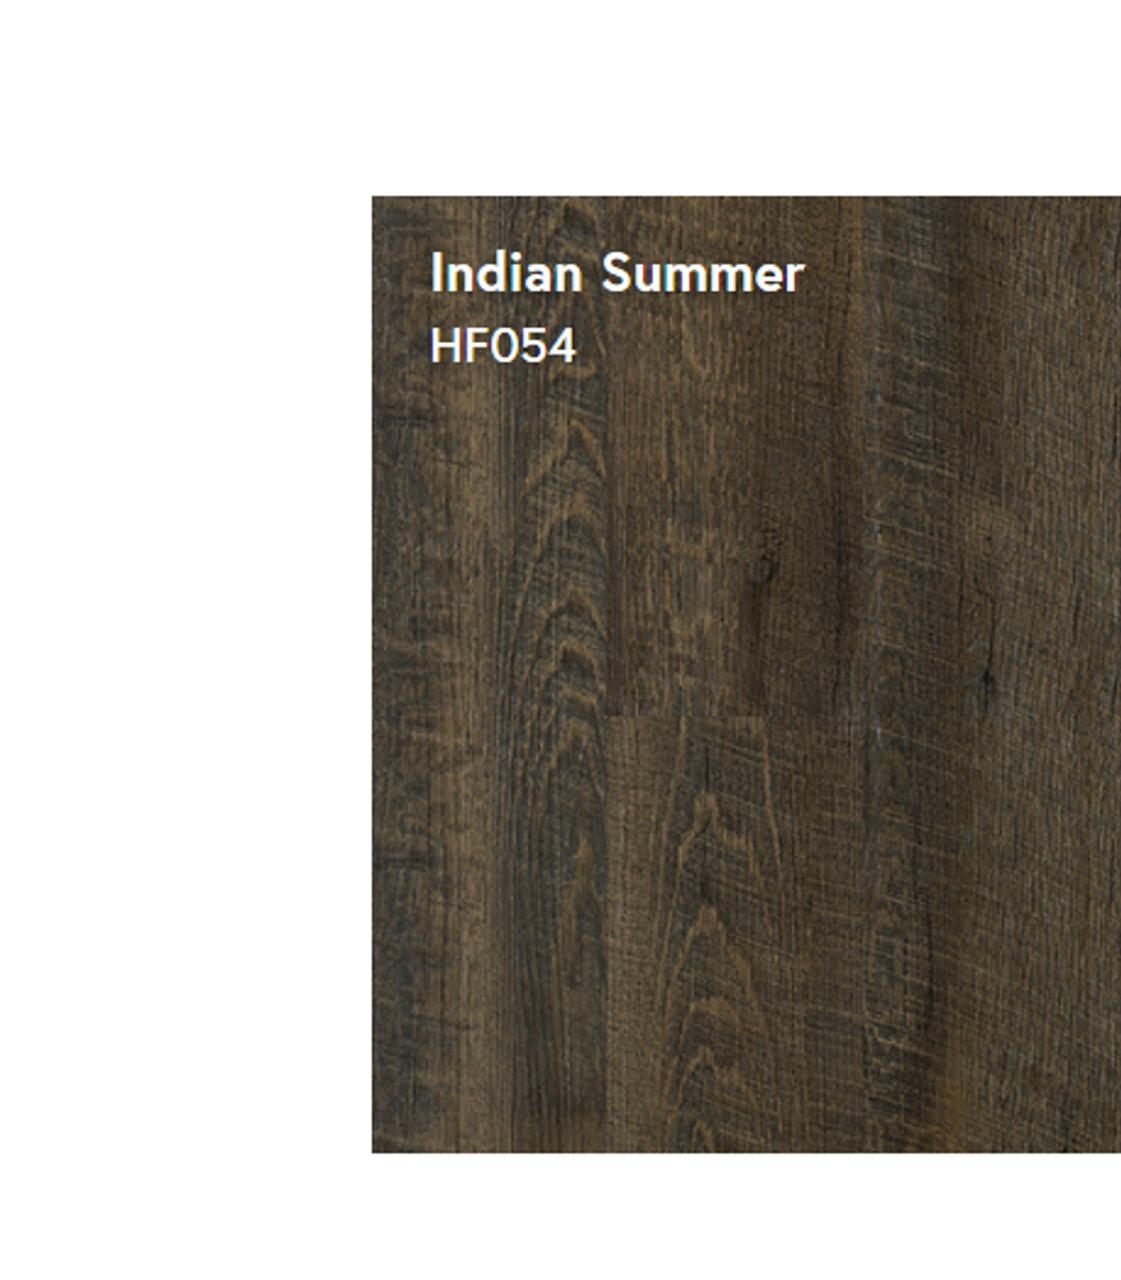 Indian Summer HF054